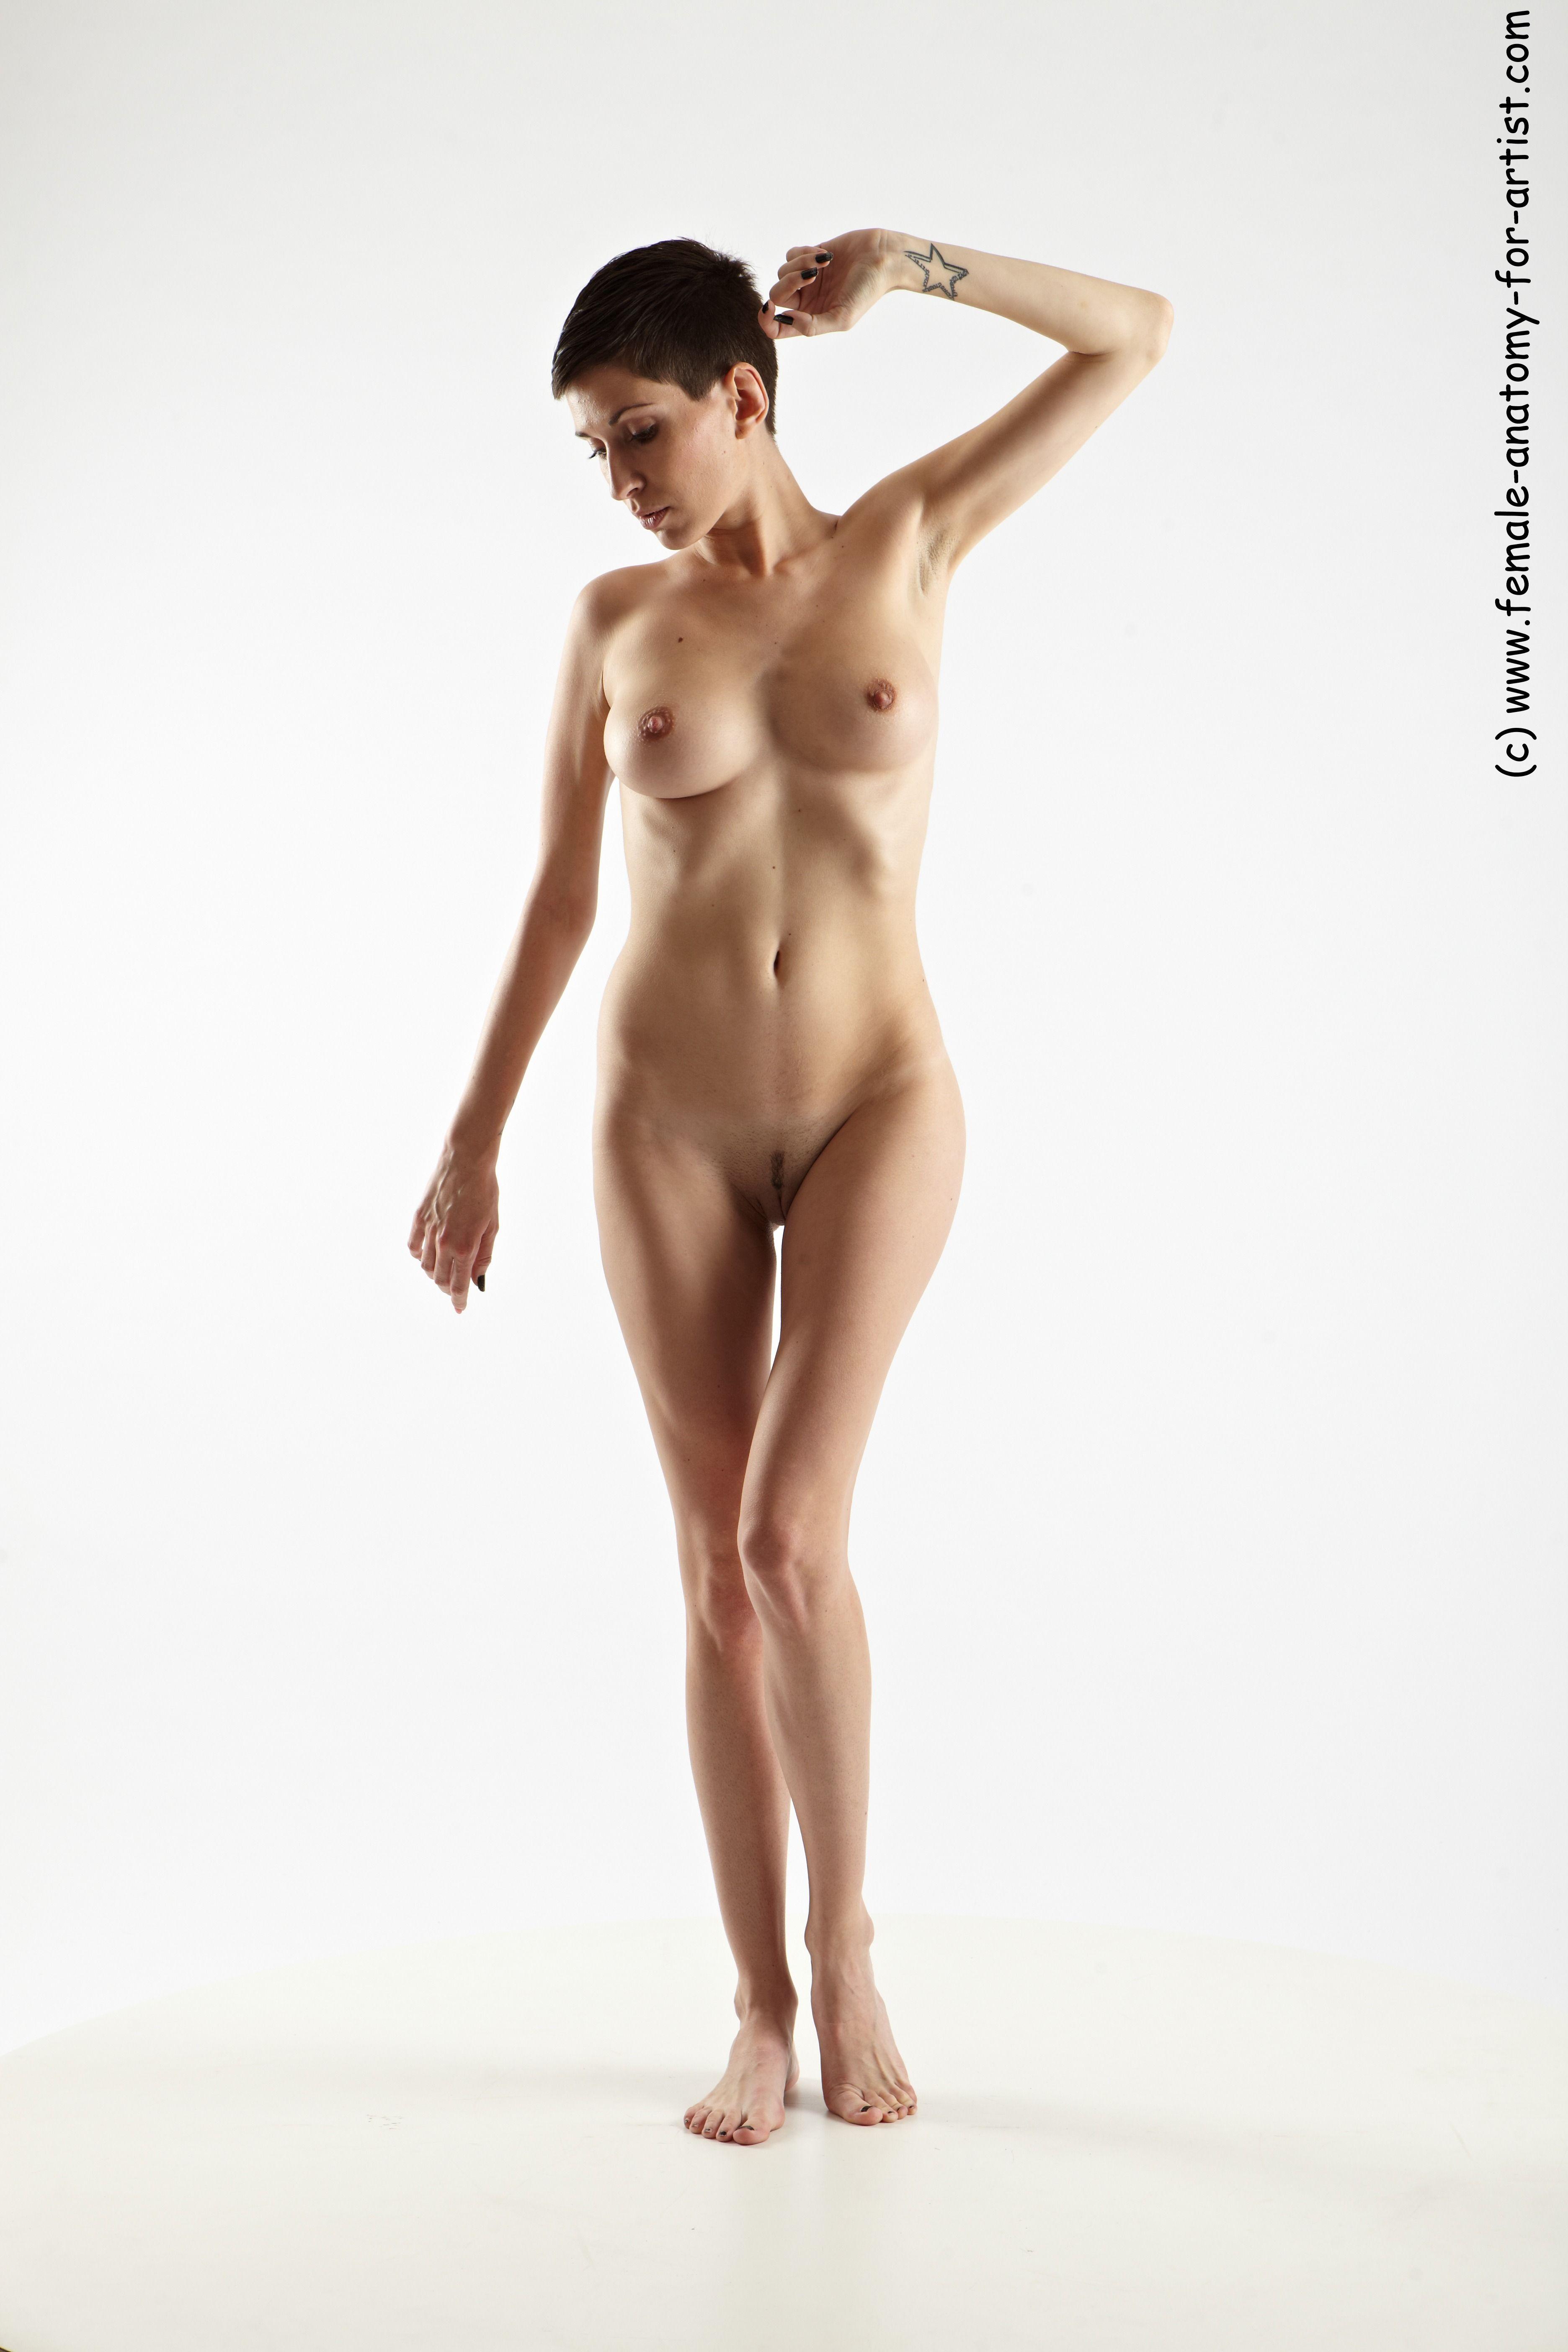 Sexy fantasy art, the women of Colero - Nakednoises